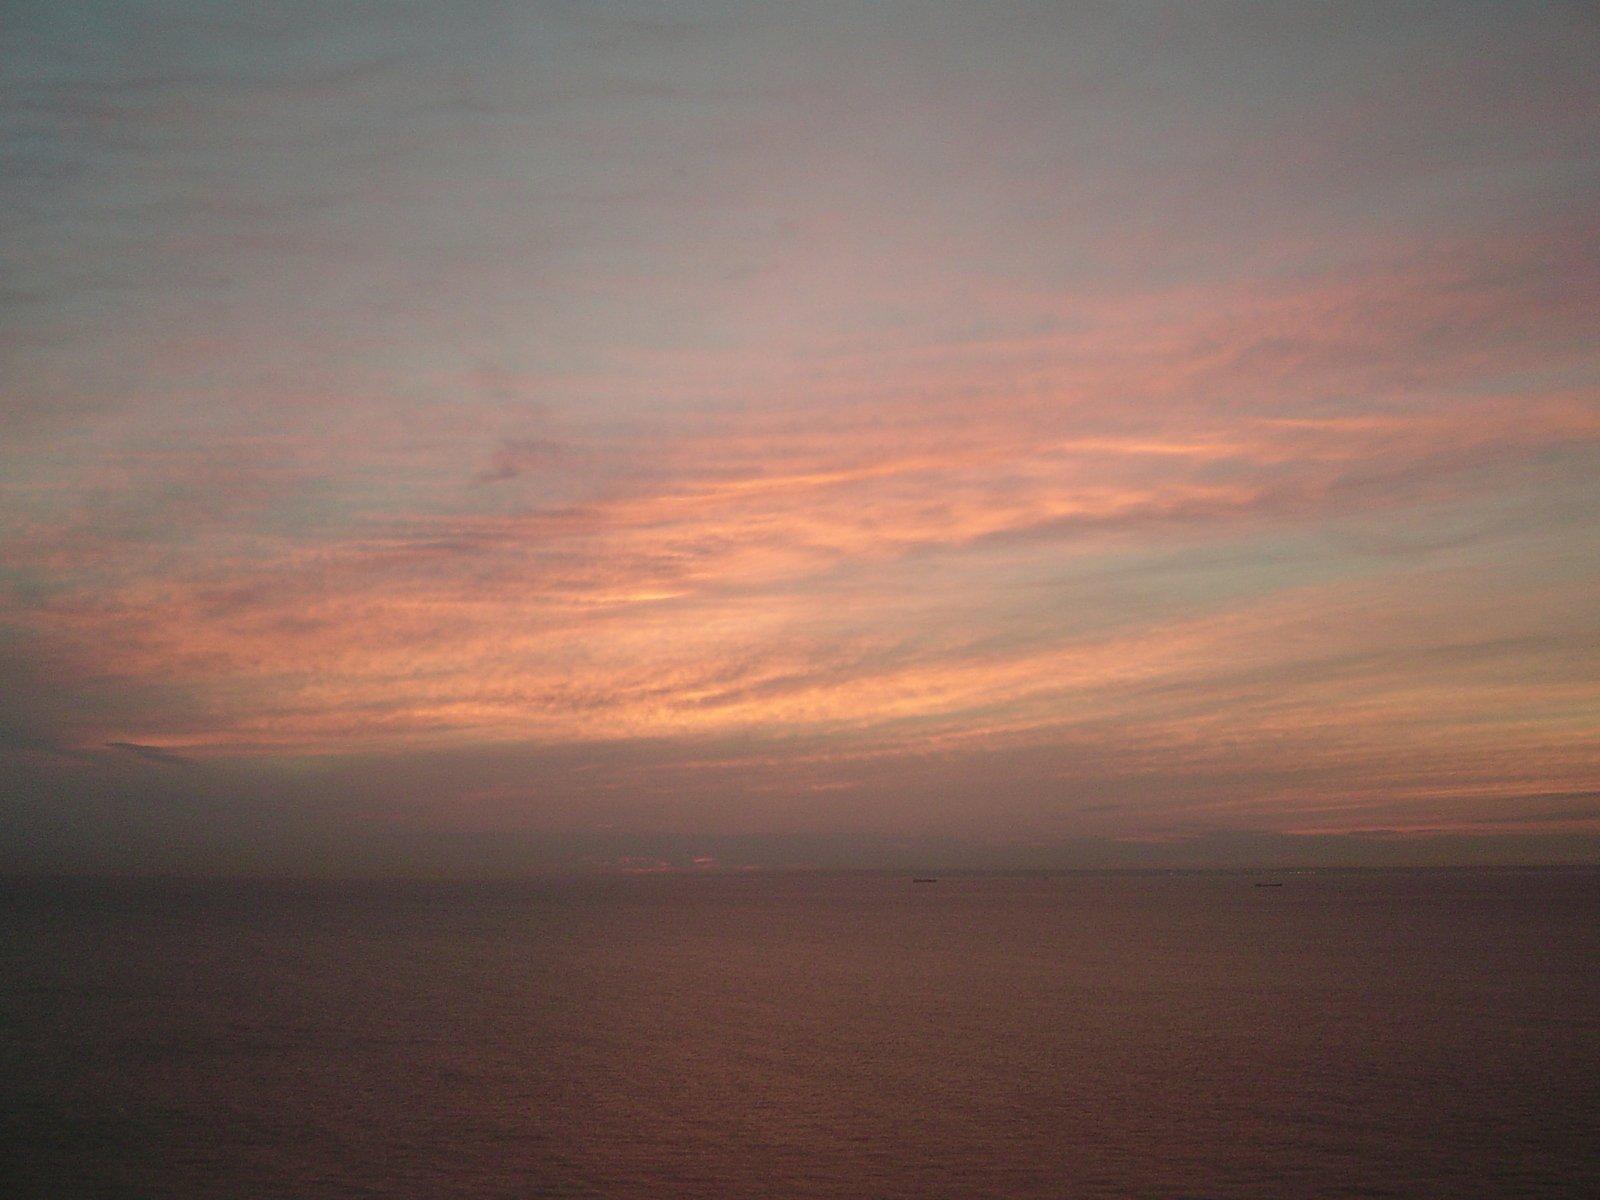 Free Zonsondergang Frankrijk Engels Kanaal Stock Photo